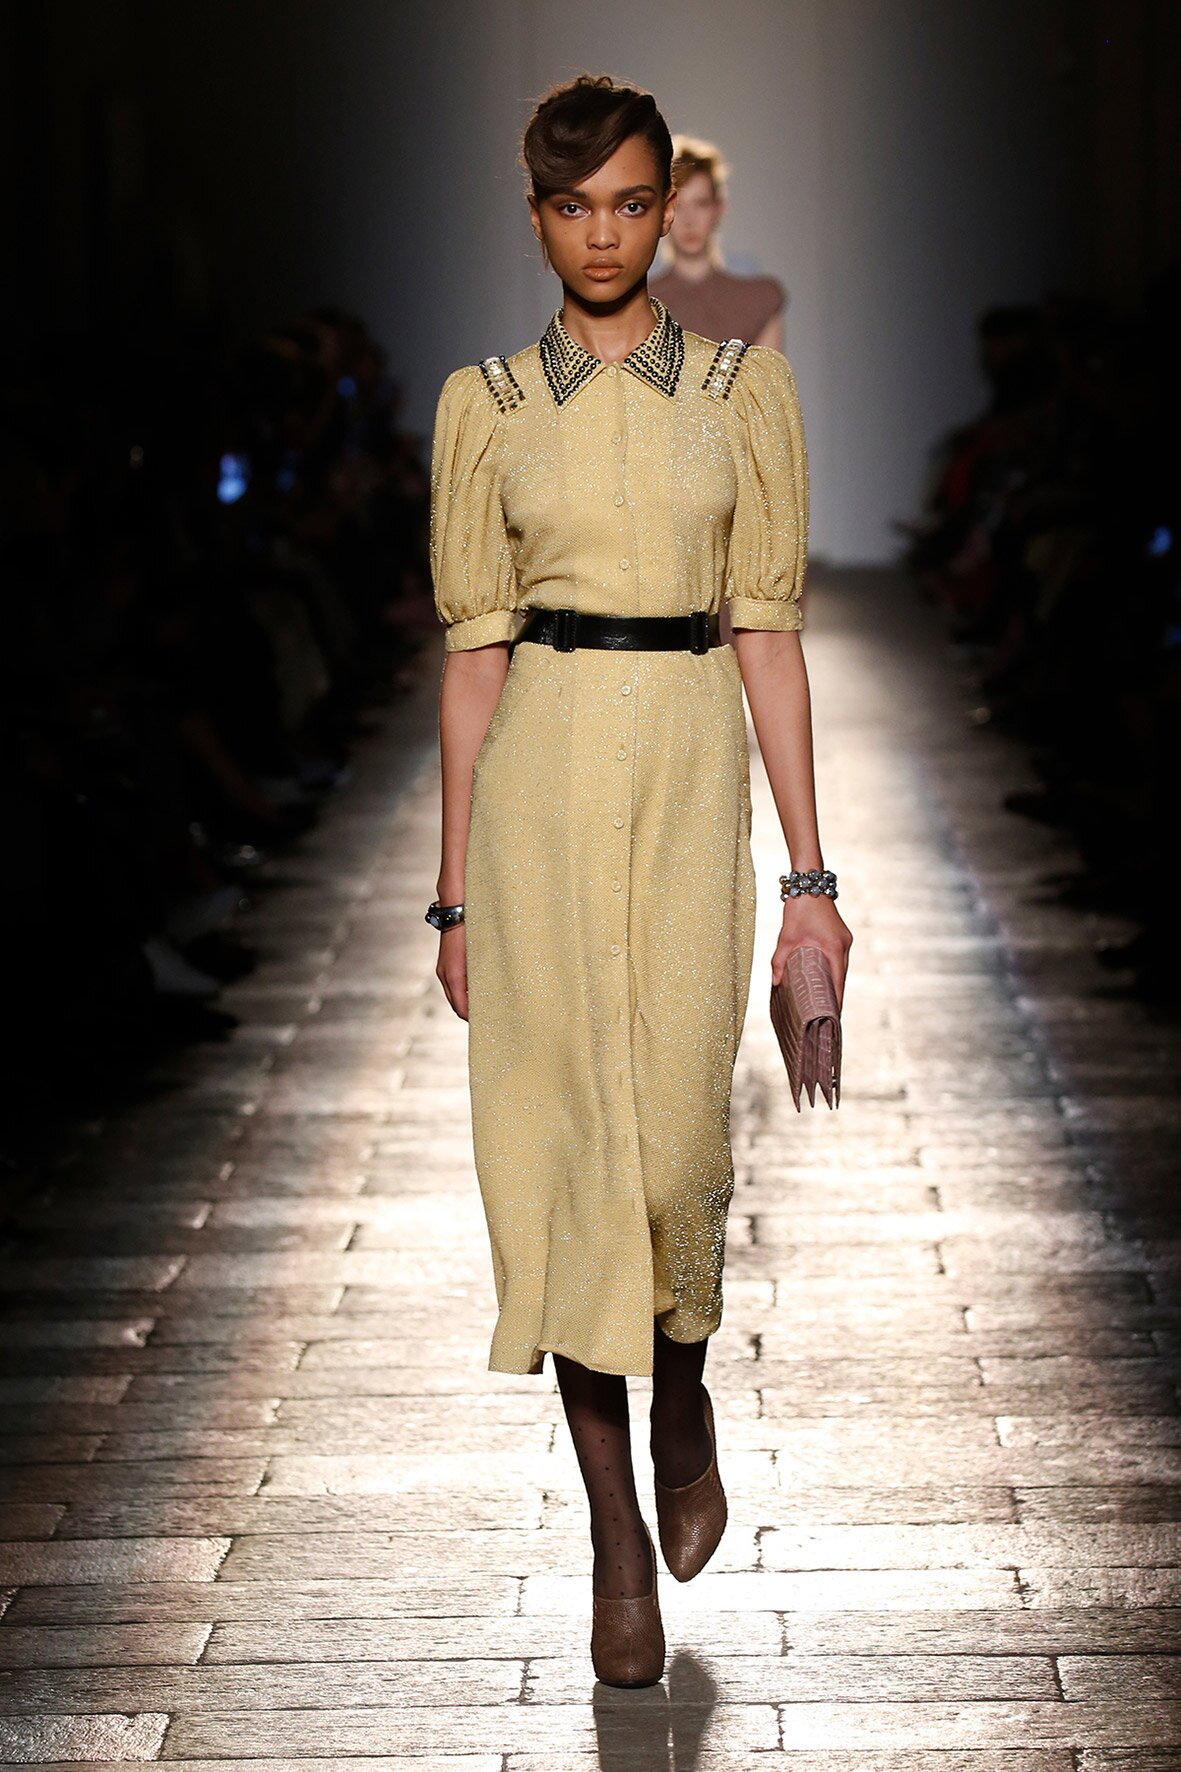 Fall Winter Fashion Trends Woman 2017-18 Bottega Veneta